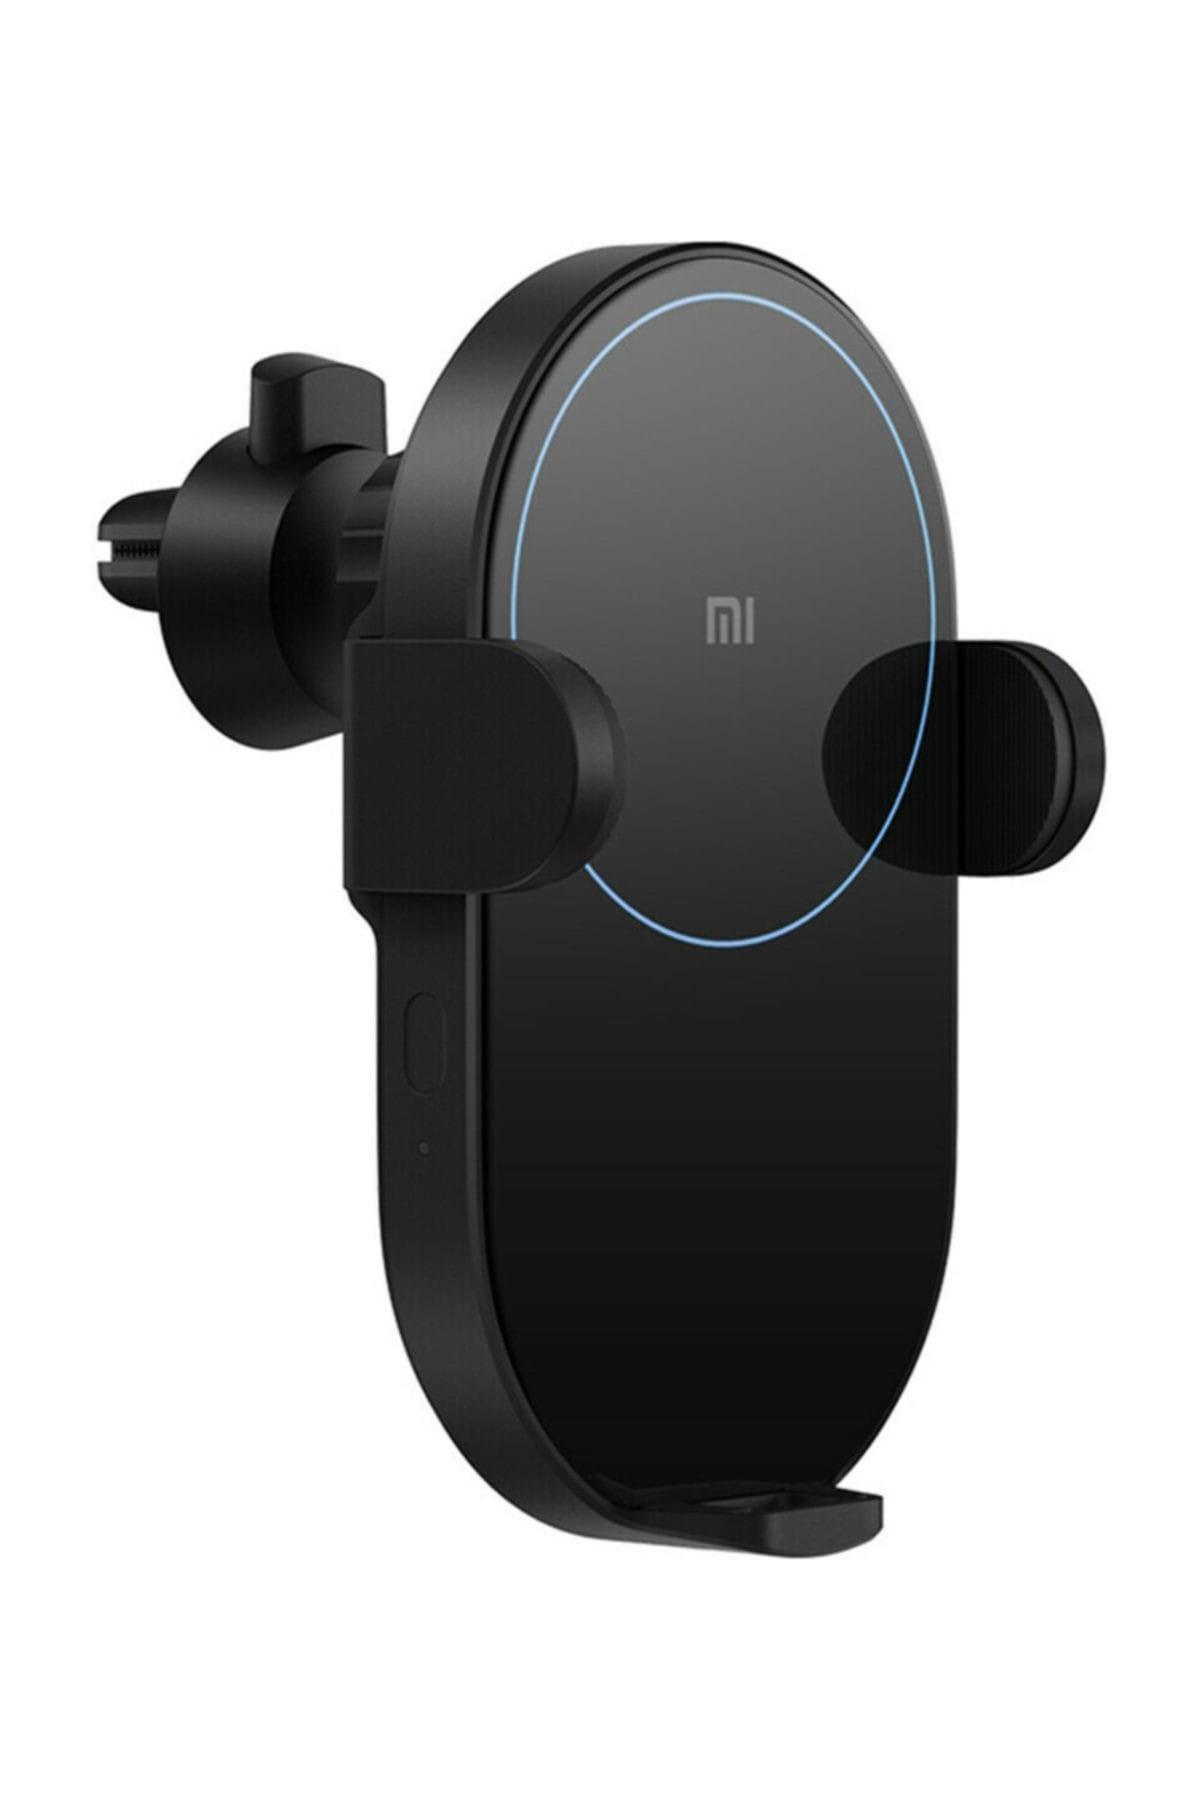 Xiaomi Wireless Kablosuz 20W Qi Hızlı Araç Şarj Cihazı 1